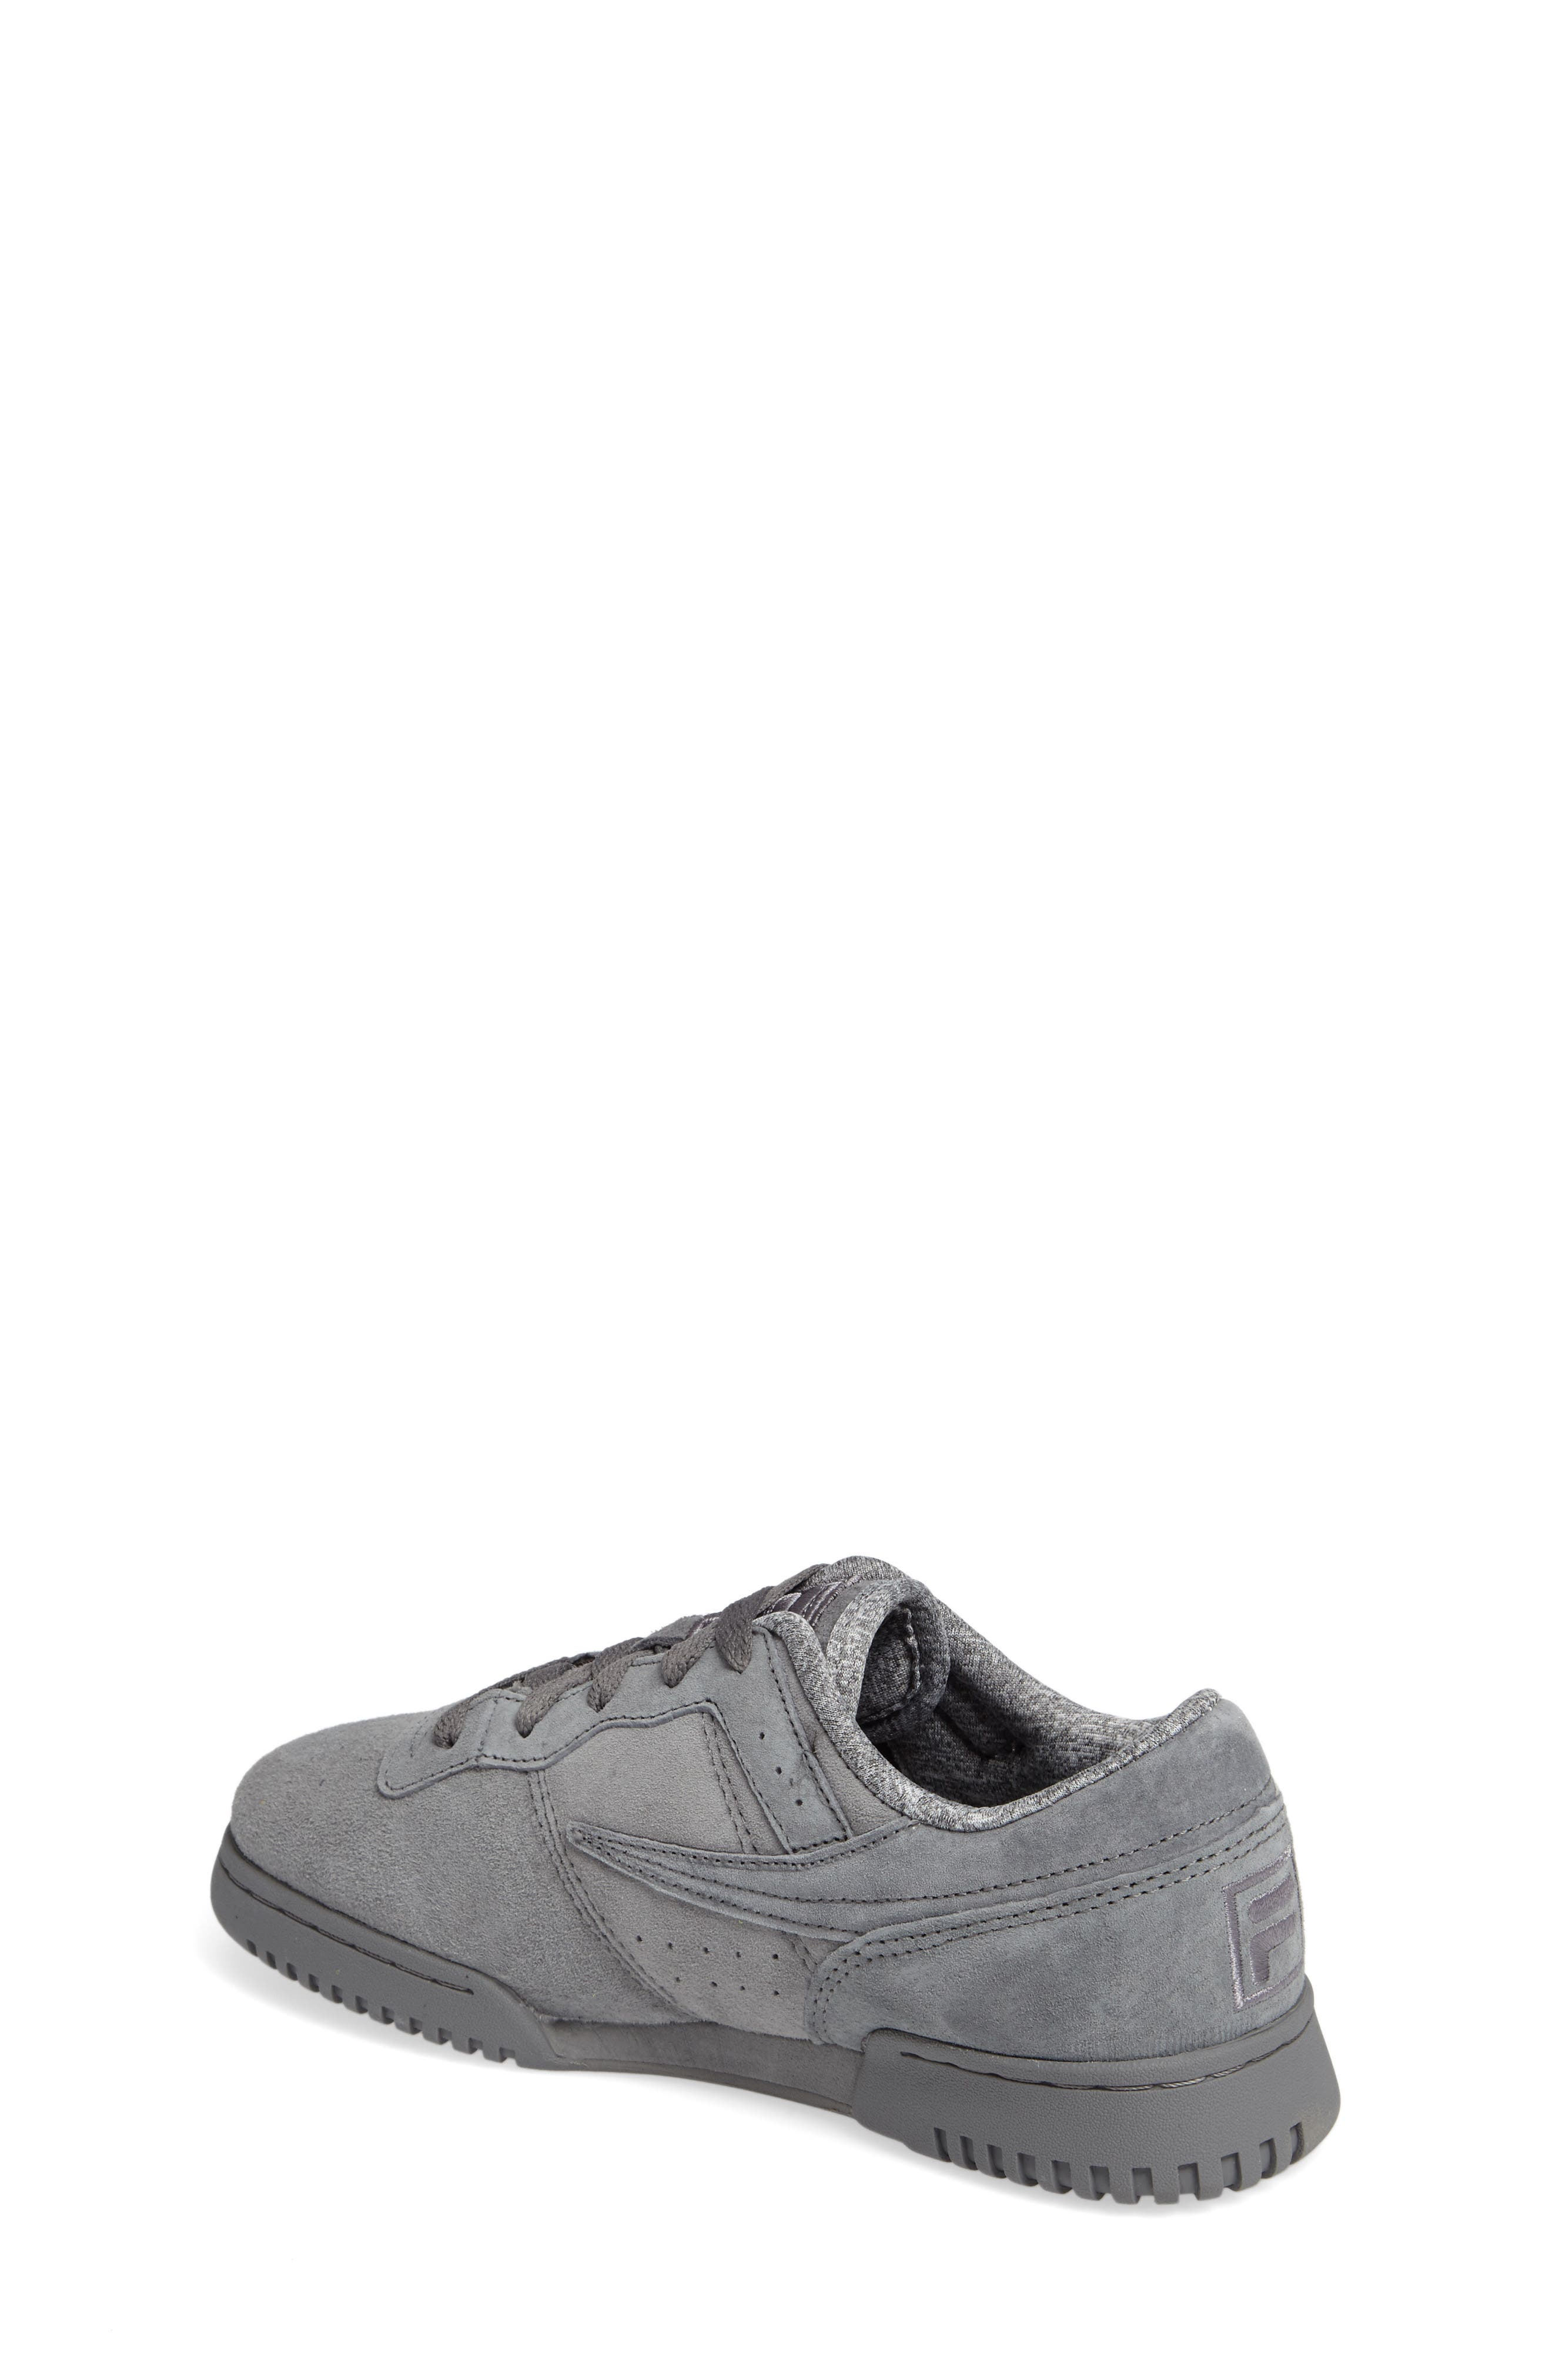 Heritage Sneaker,                             Alternate thumbnail 2, color,                             050